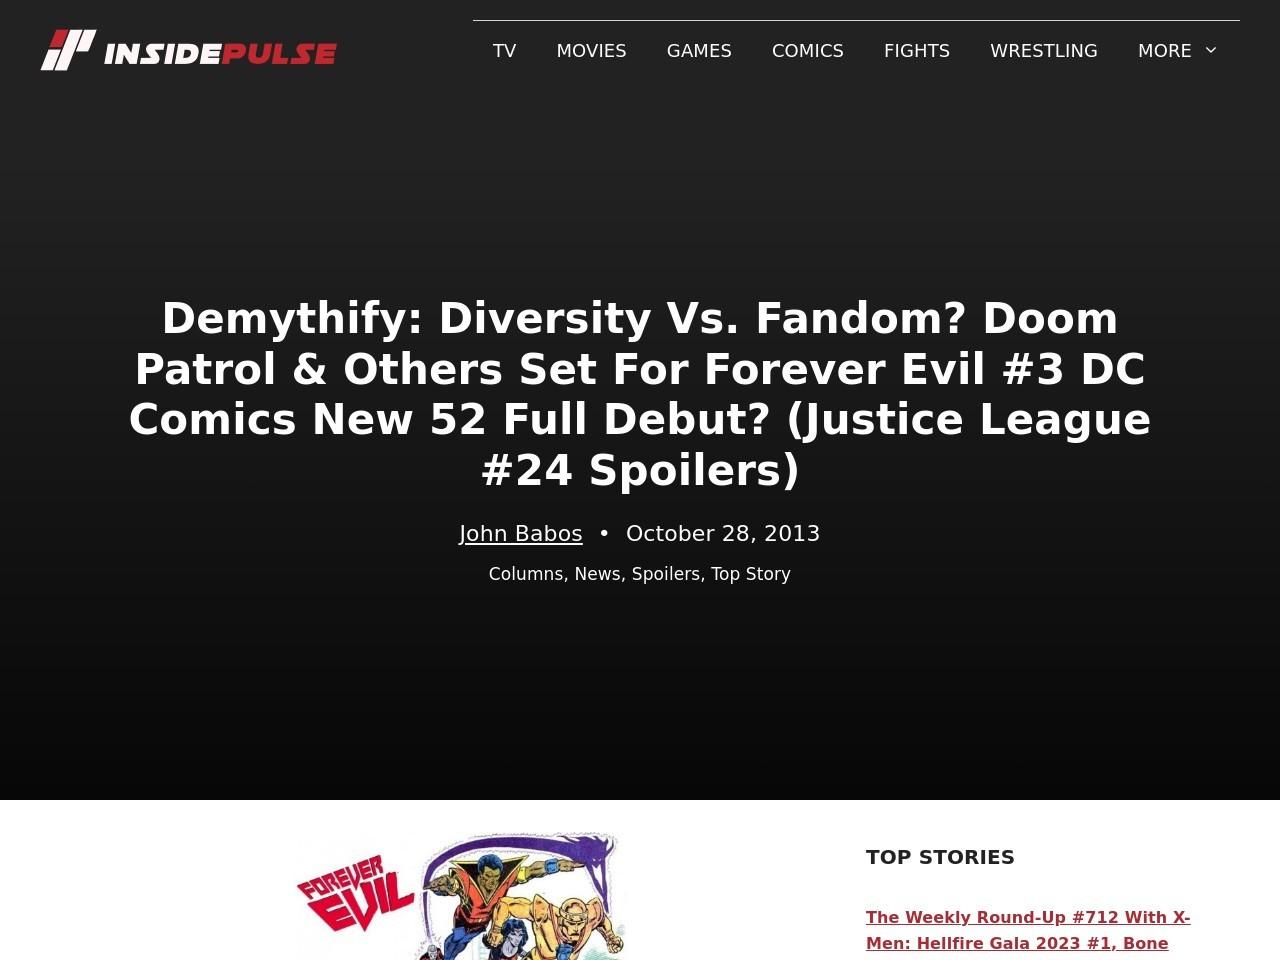 Demythify: Diversity Vs. Fandom? Doom Patrol & Others Set For Forever Evil #3 …